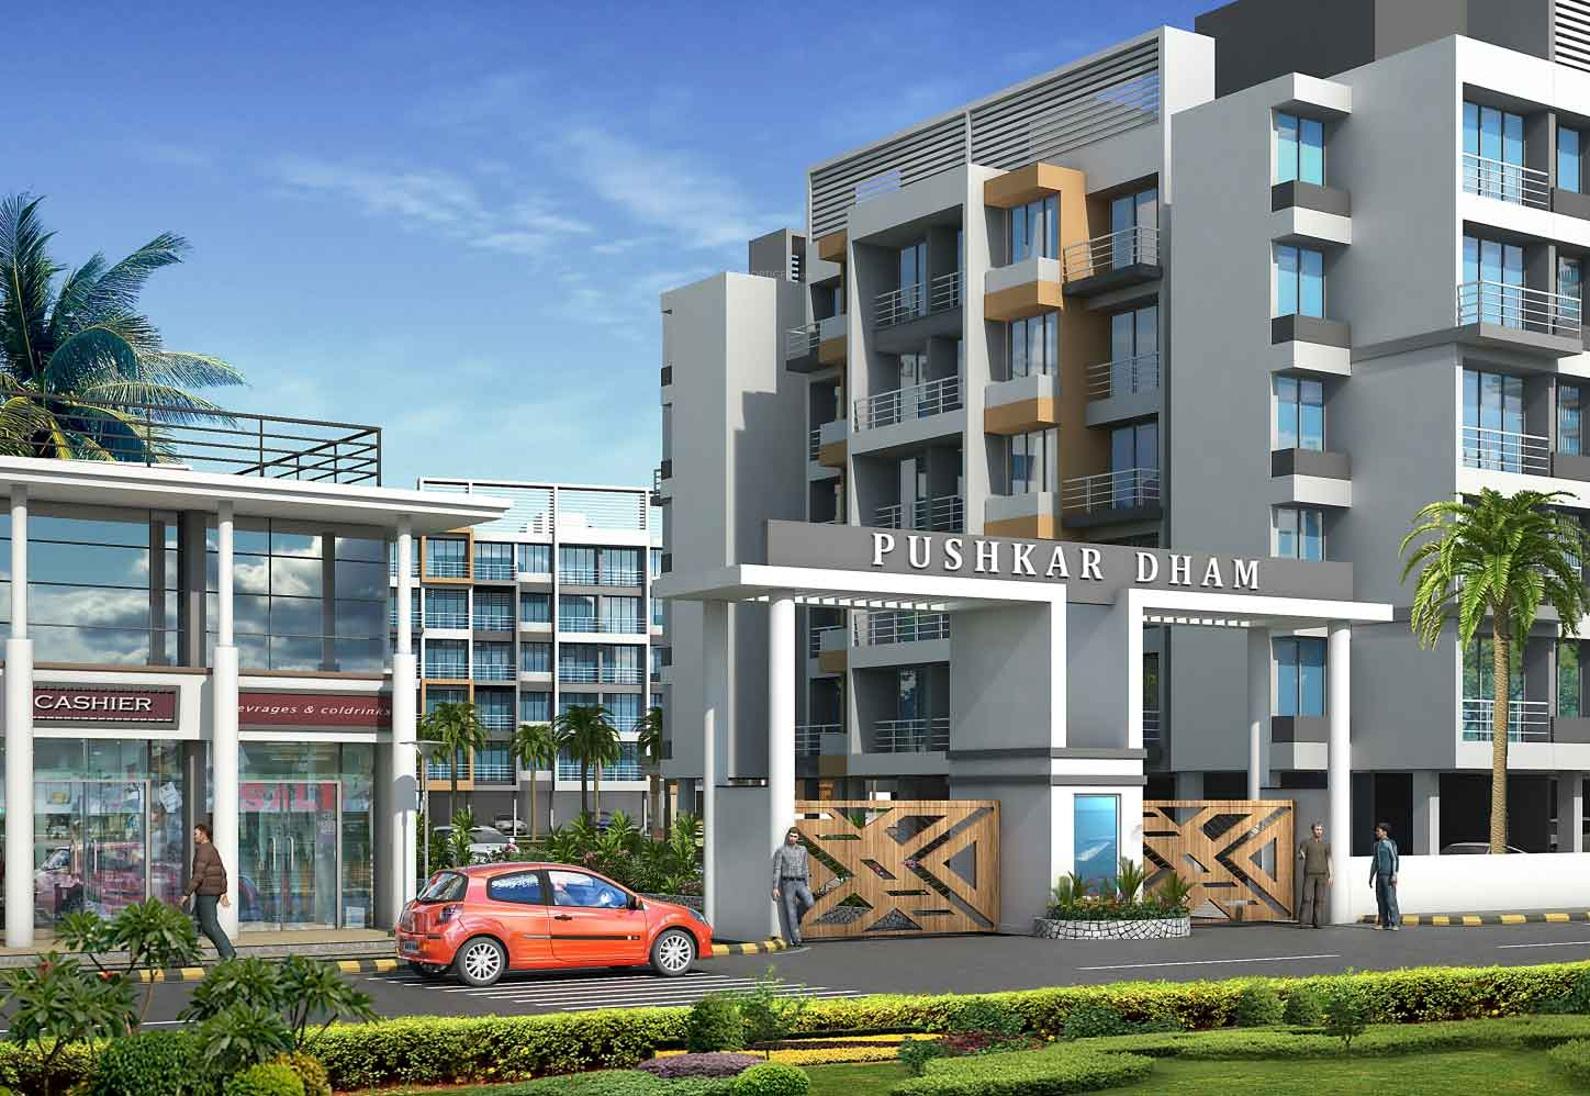 640 Sq Ft 1 Bhk 1t Apartment For Sale In Pushkar Gruh